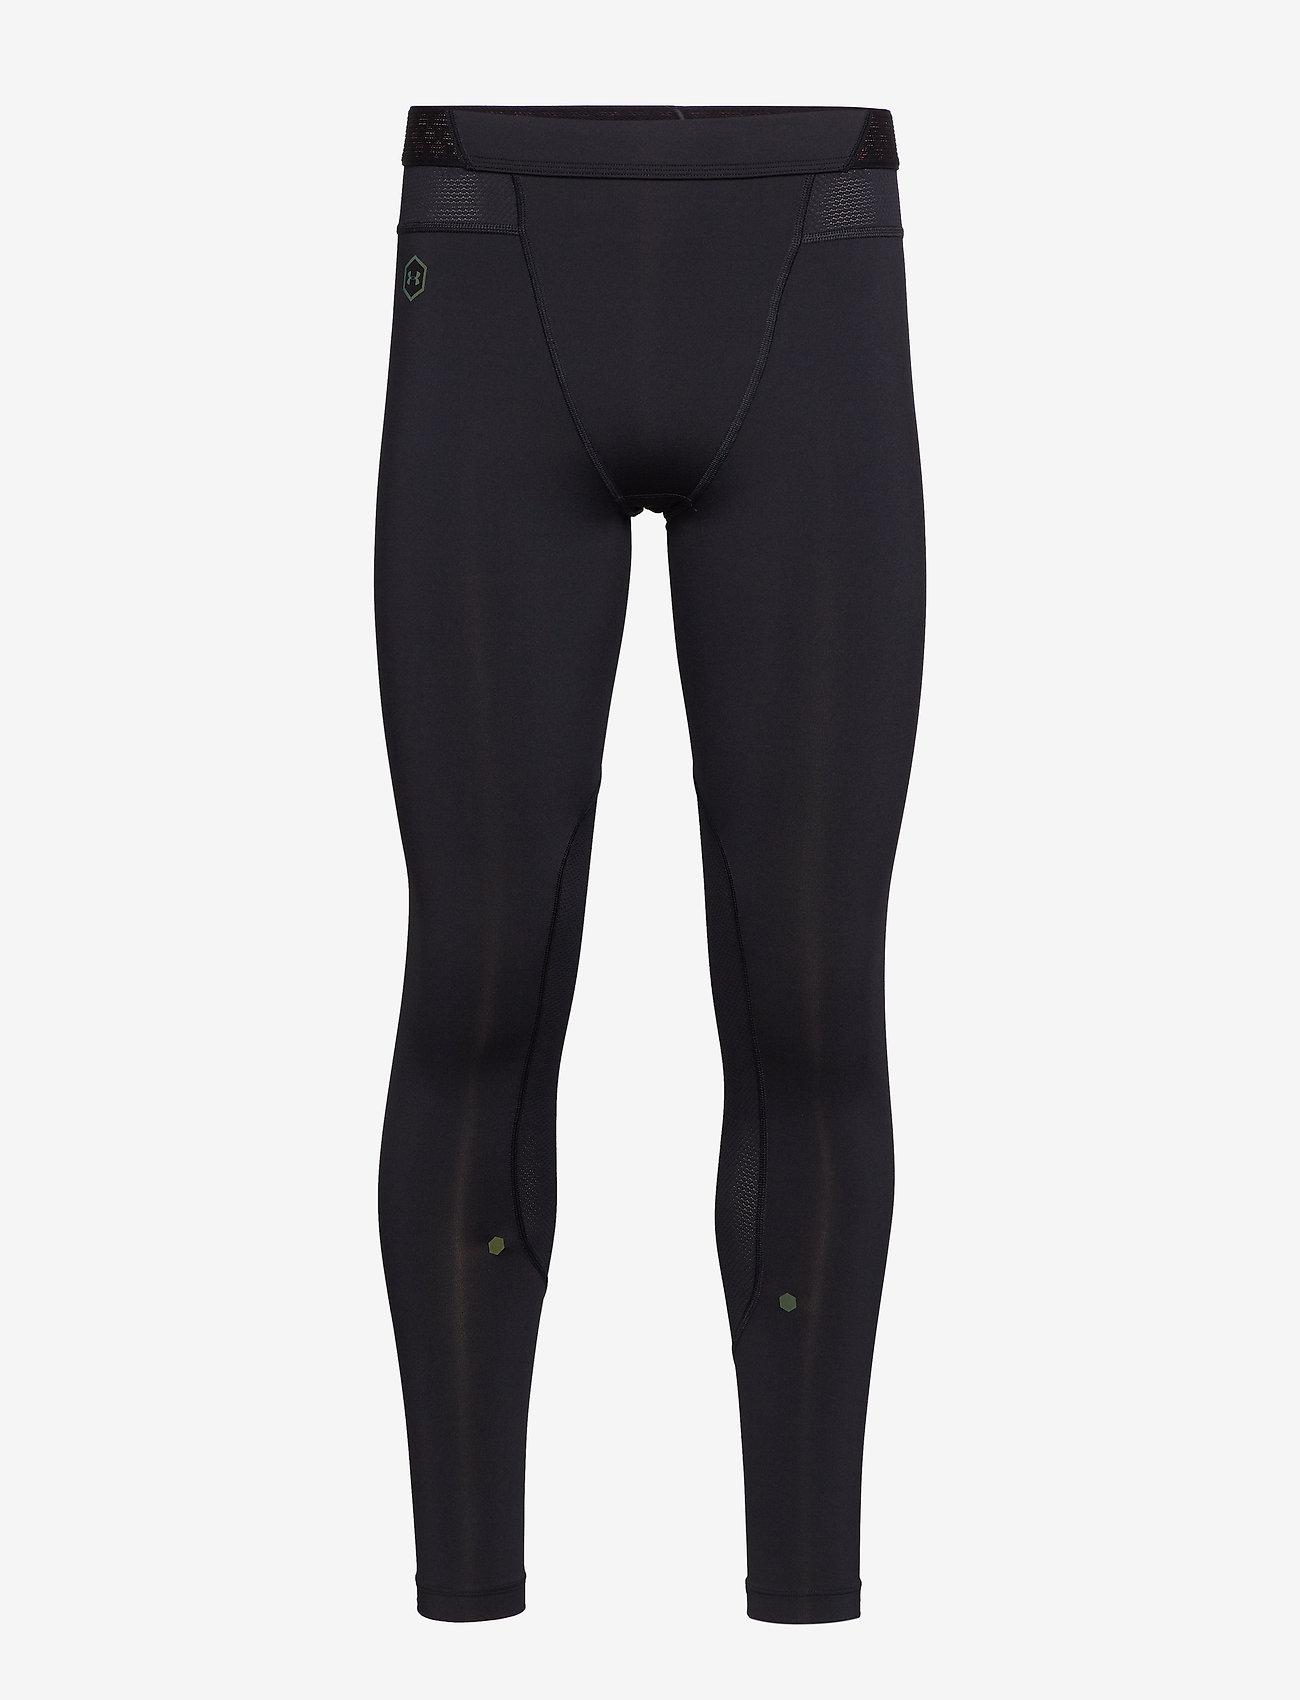 Under Armour - UA Rush HG Leggings - running & training tights - black - 1